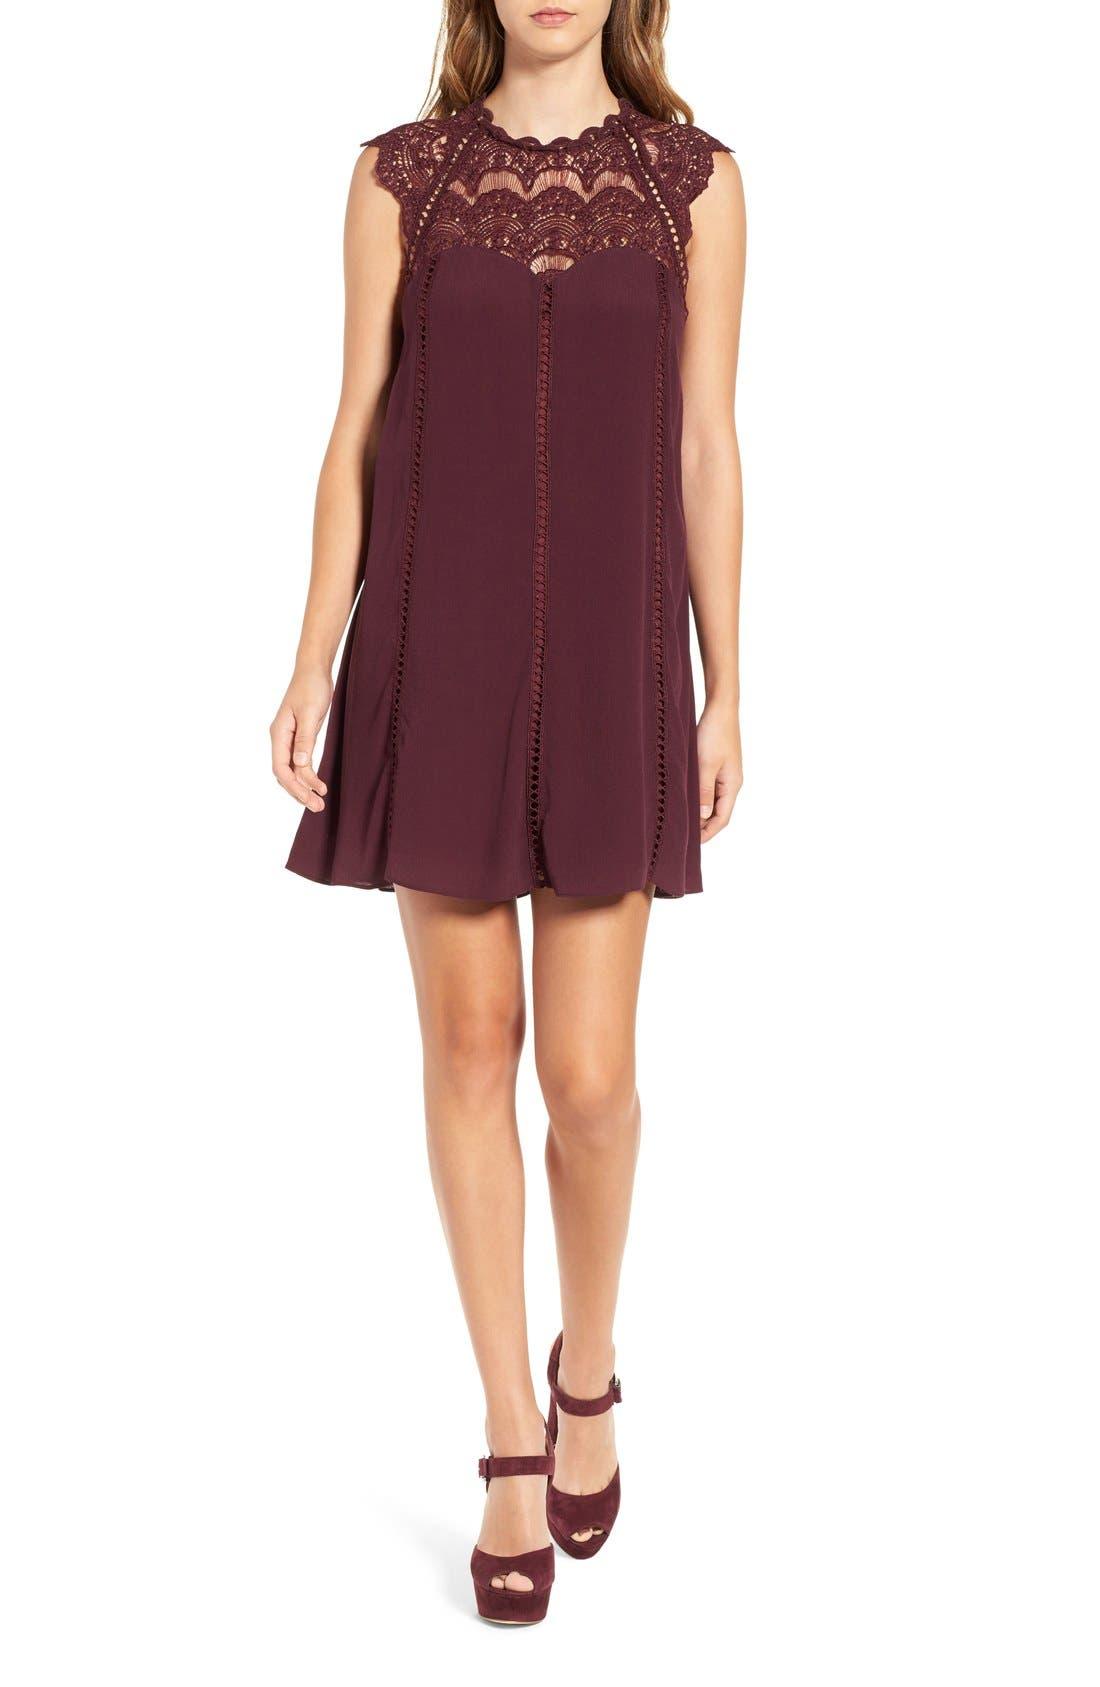 Alternate Image 1 Selected - 4SI3NNA Lace Yoke Shift Dress